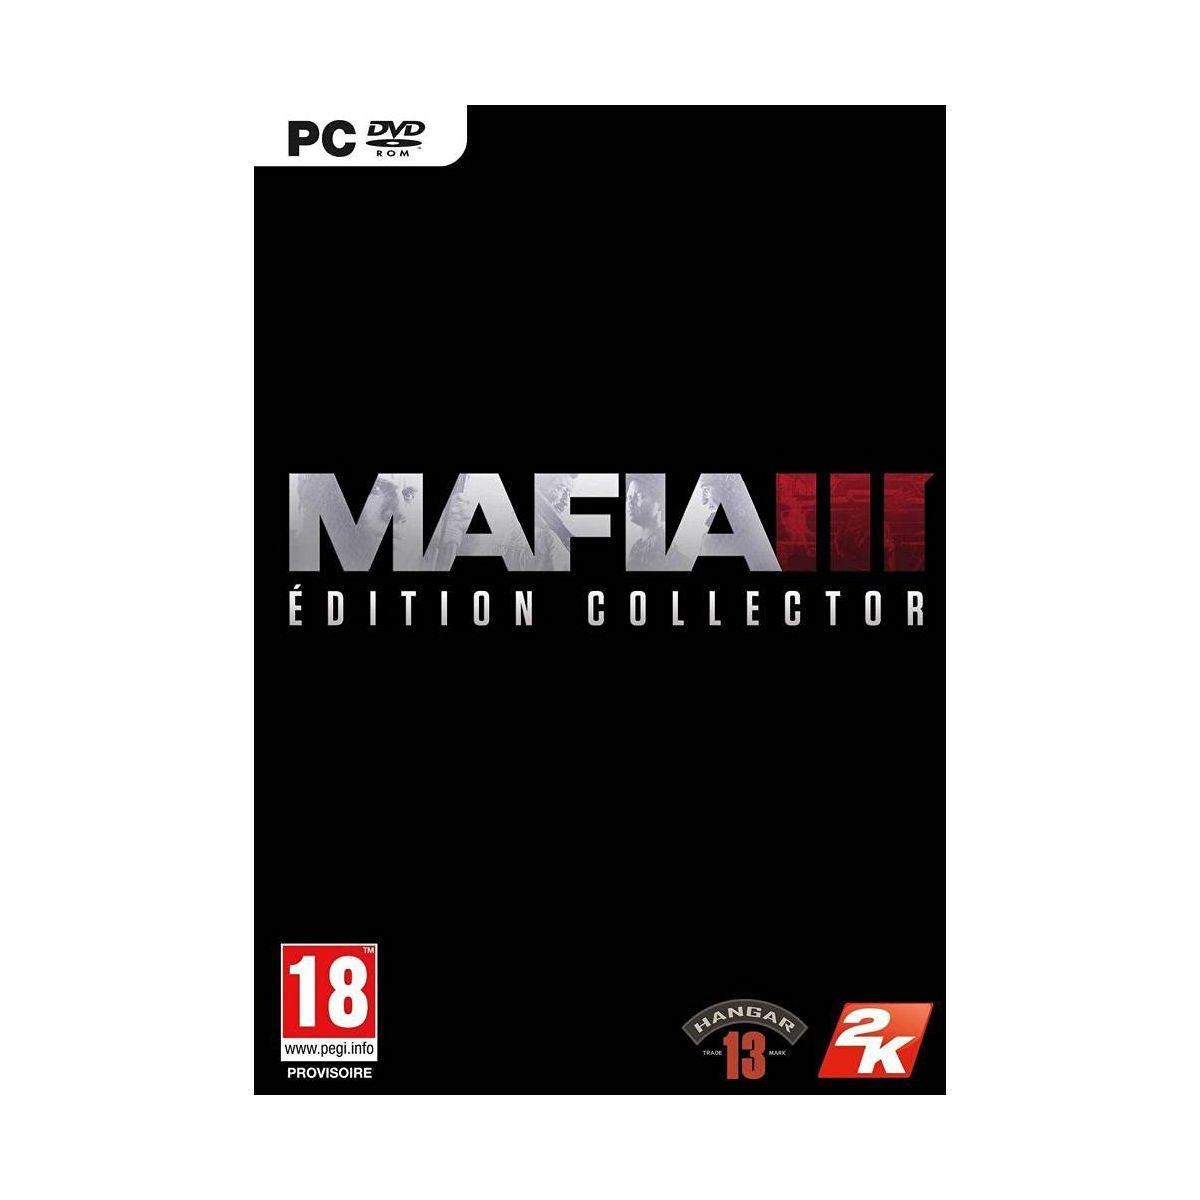 Jeu pc take 2 mafia 3 collector - 20% de remise imm?diate avec...